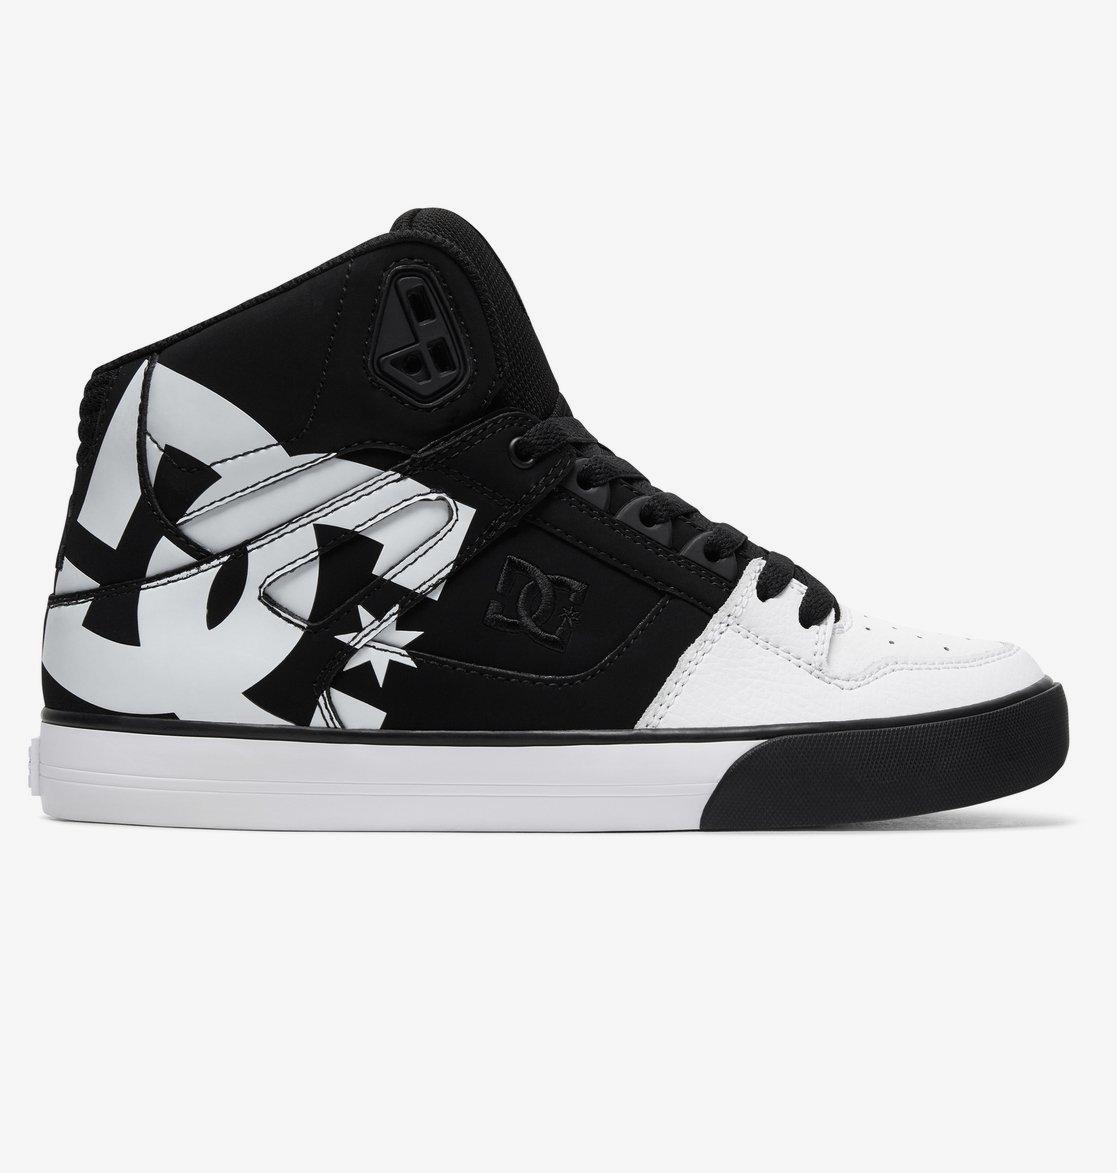 new product 5c8f4 23206 Pure WC SP - High-Top-Schuhe für Männer ADYS400050 | DC Shoes